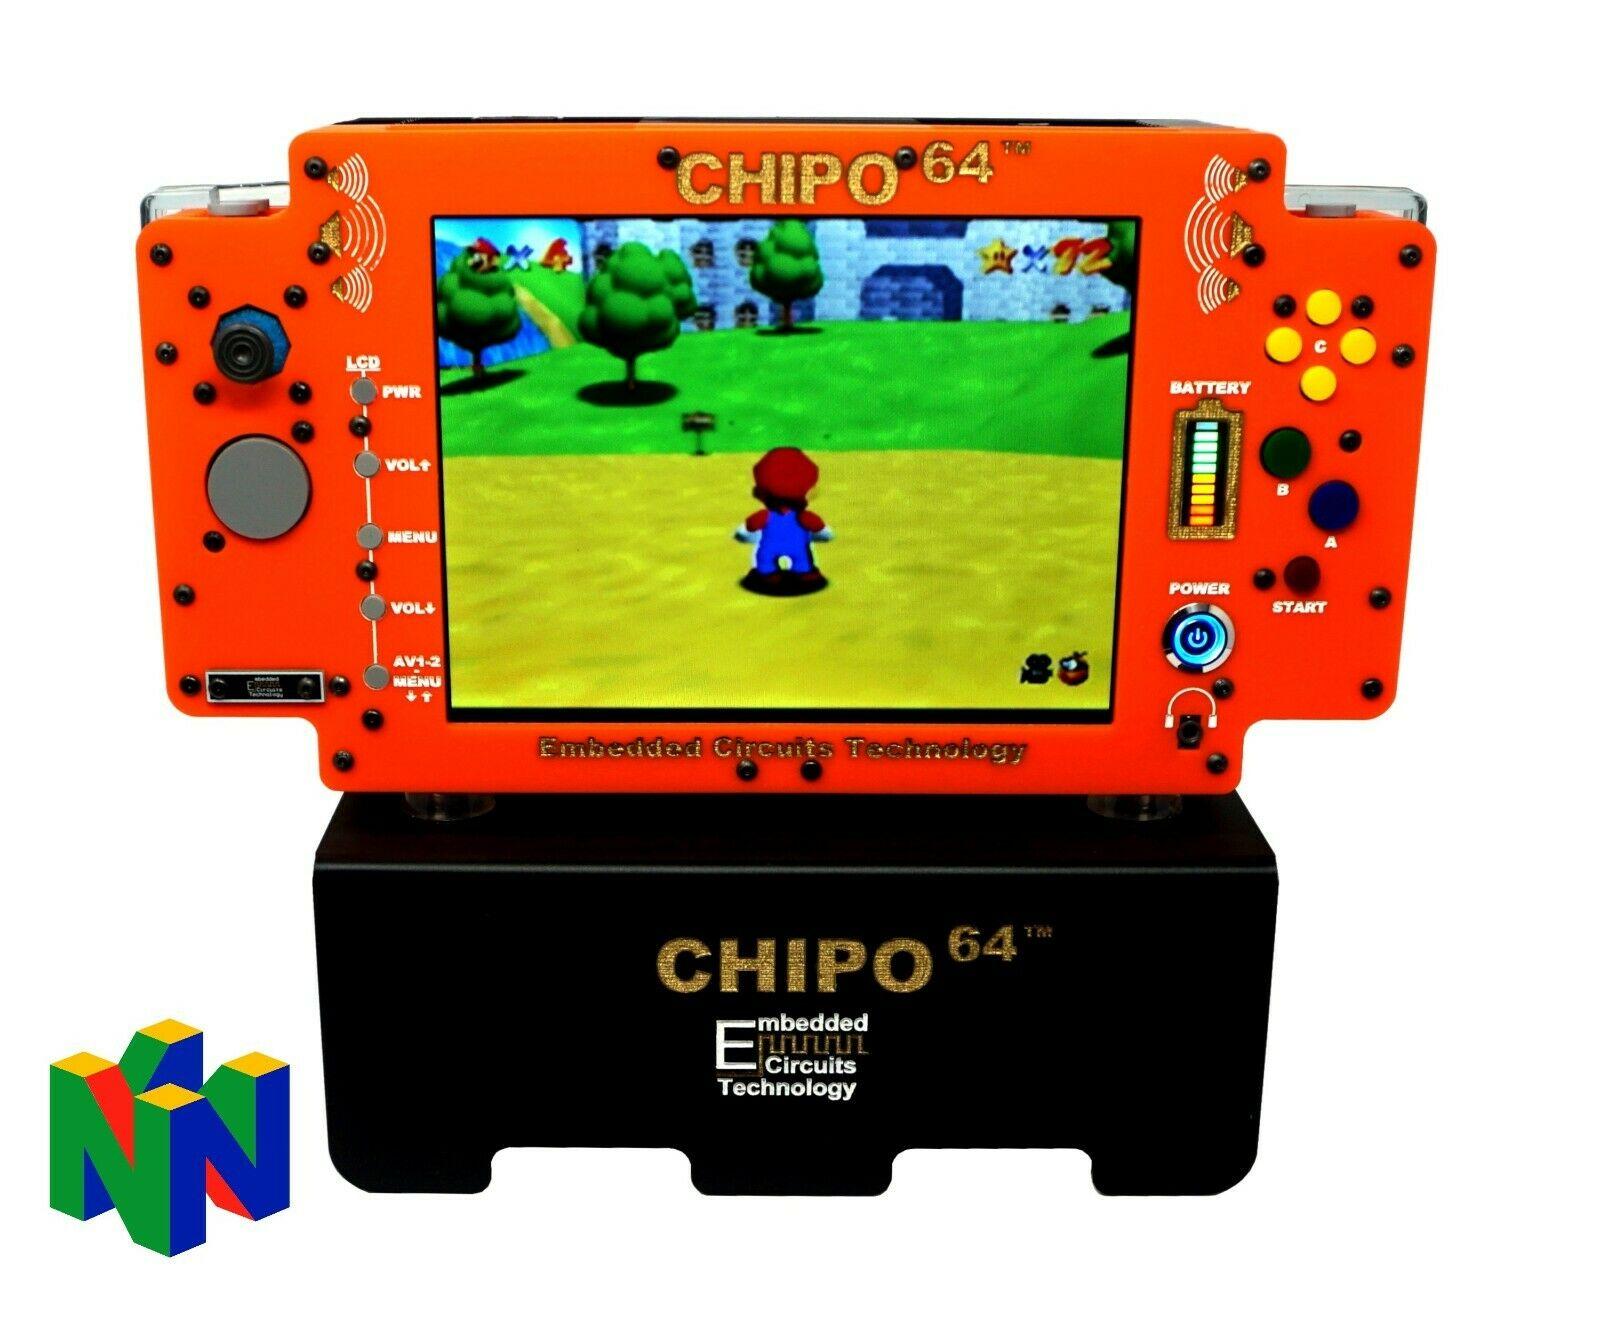 N64 Nintendo 64 Console PORTABLE System Games Retro gaming